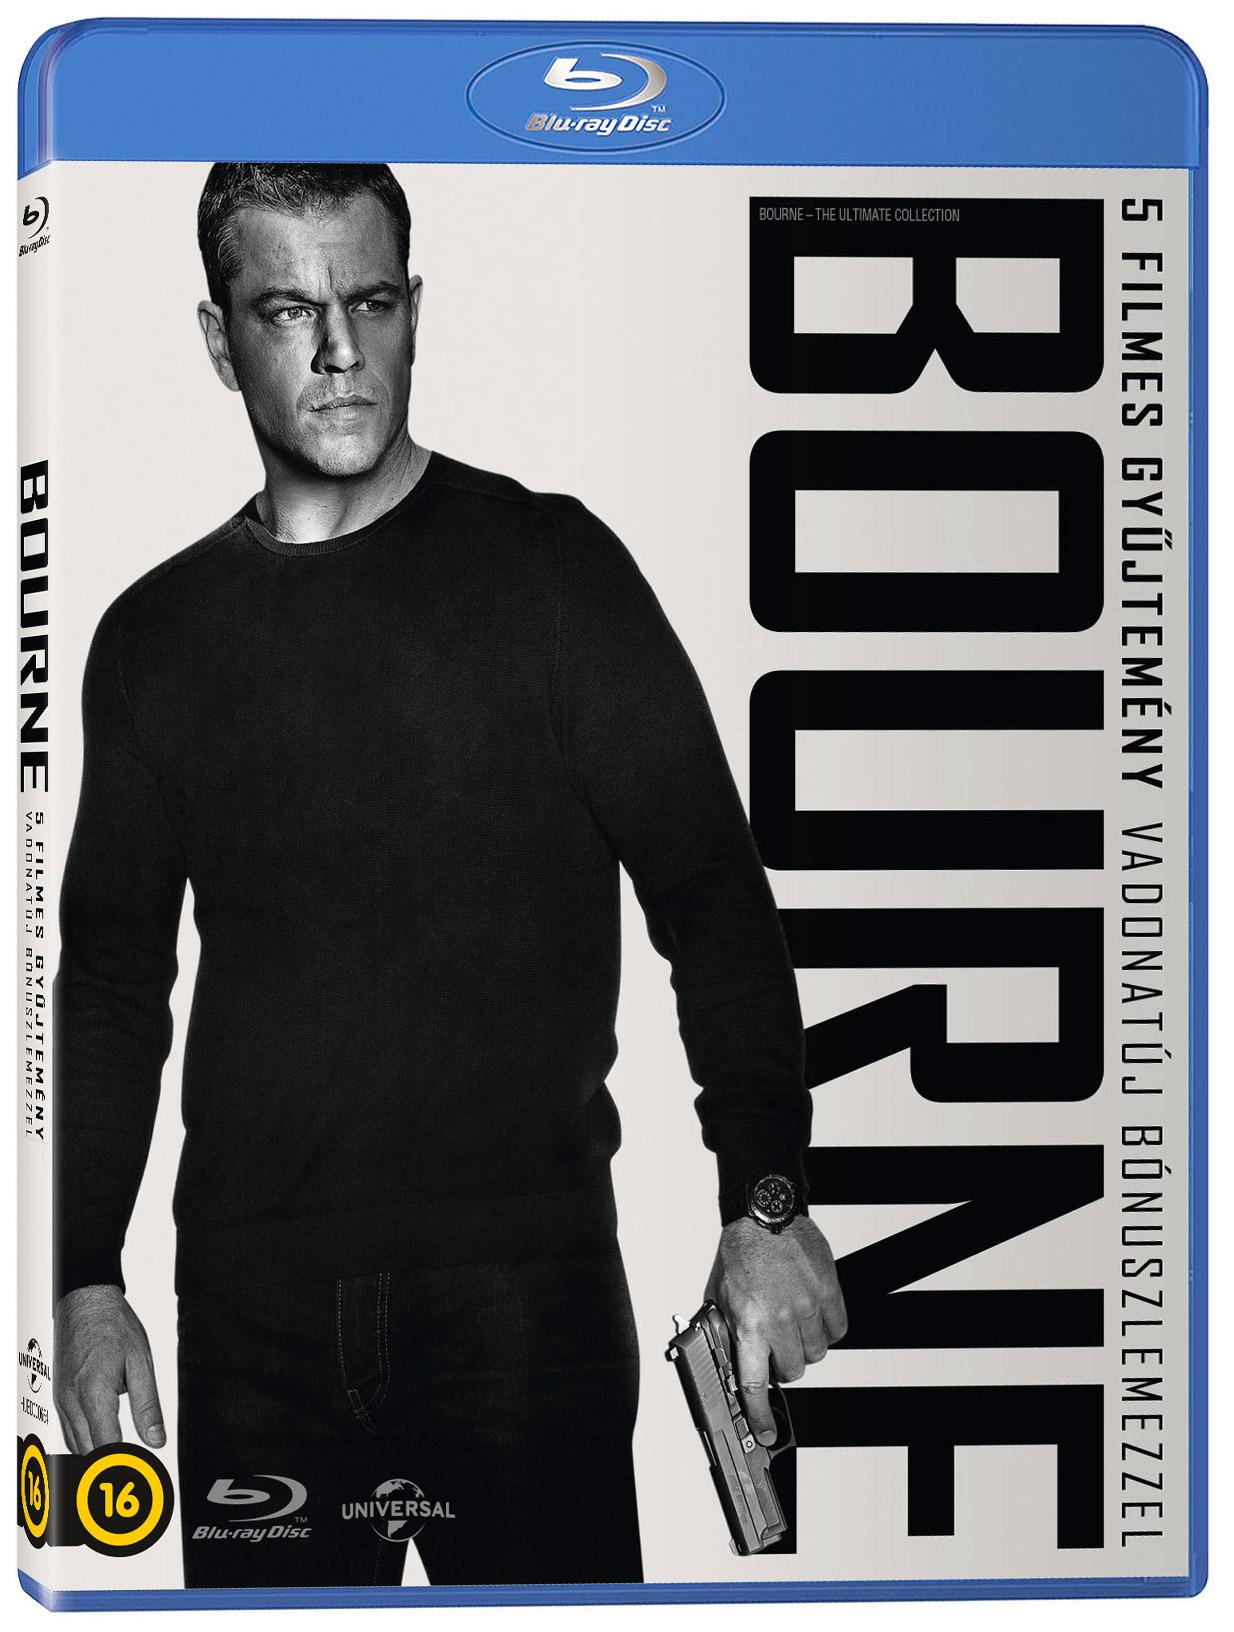 Bourne-gyűjtemény (5 Blu-ray + DVD) Blu-ray